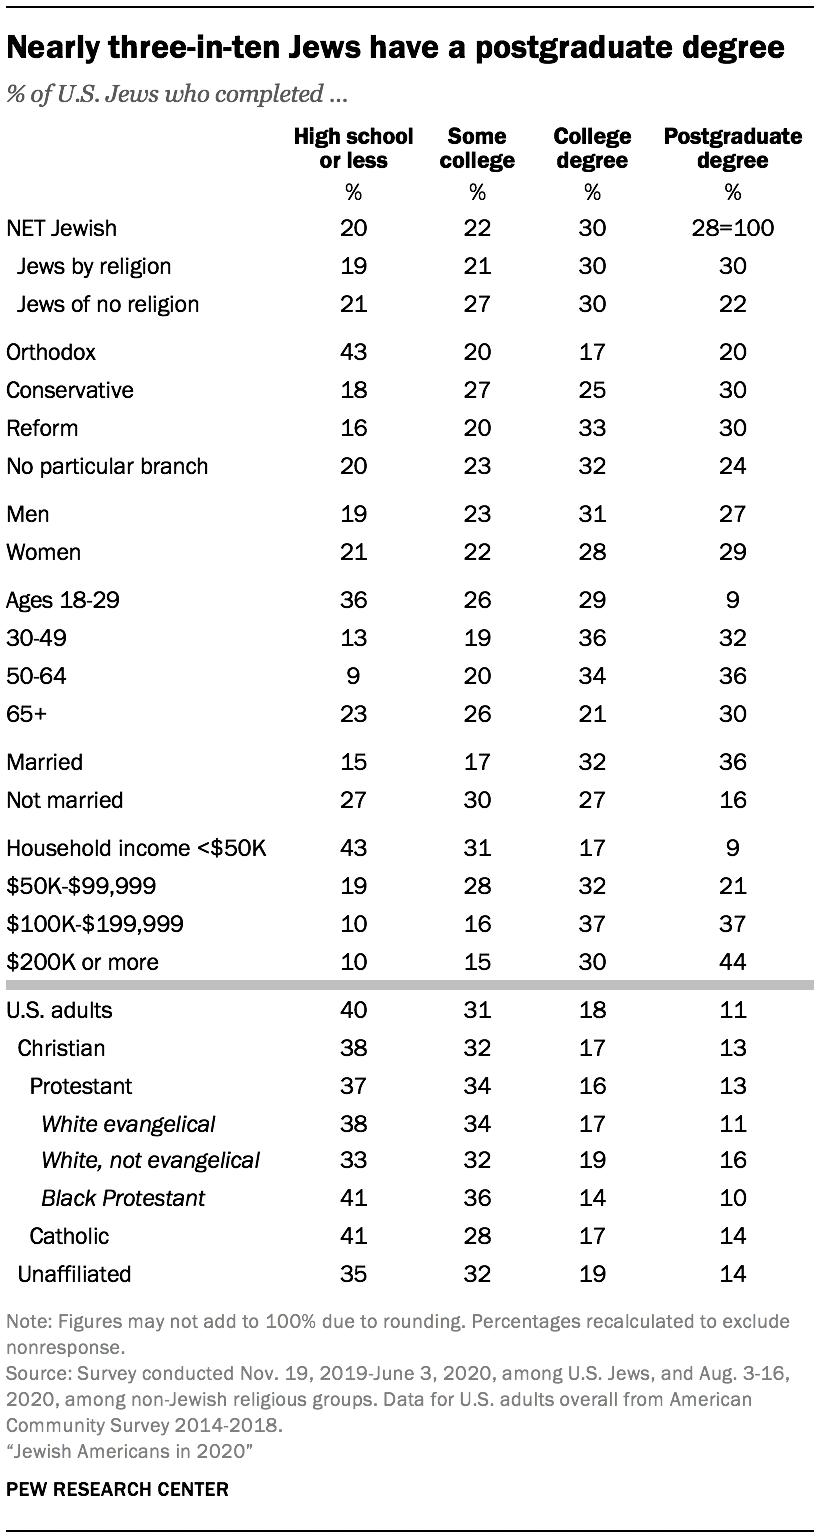 Nearly three-in-ten Jews have a postgraduate degree